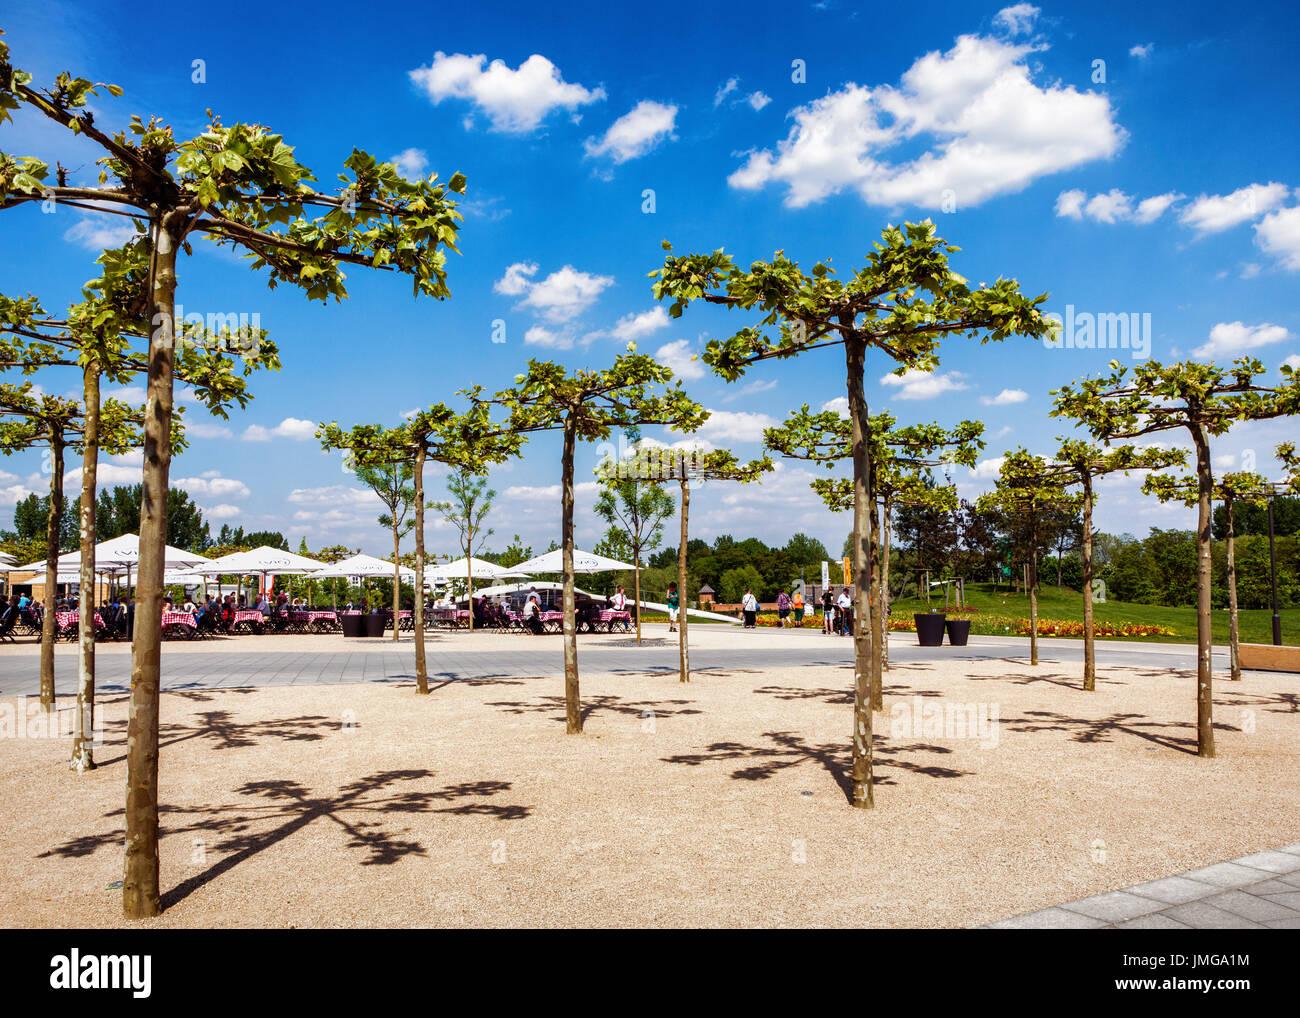 Berlin,Marzahn. Gardens of the World botanic garden,Gärten der Welt,IGA 2017 outdoor cafe and decorative trees - Stock Image